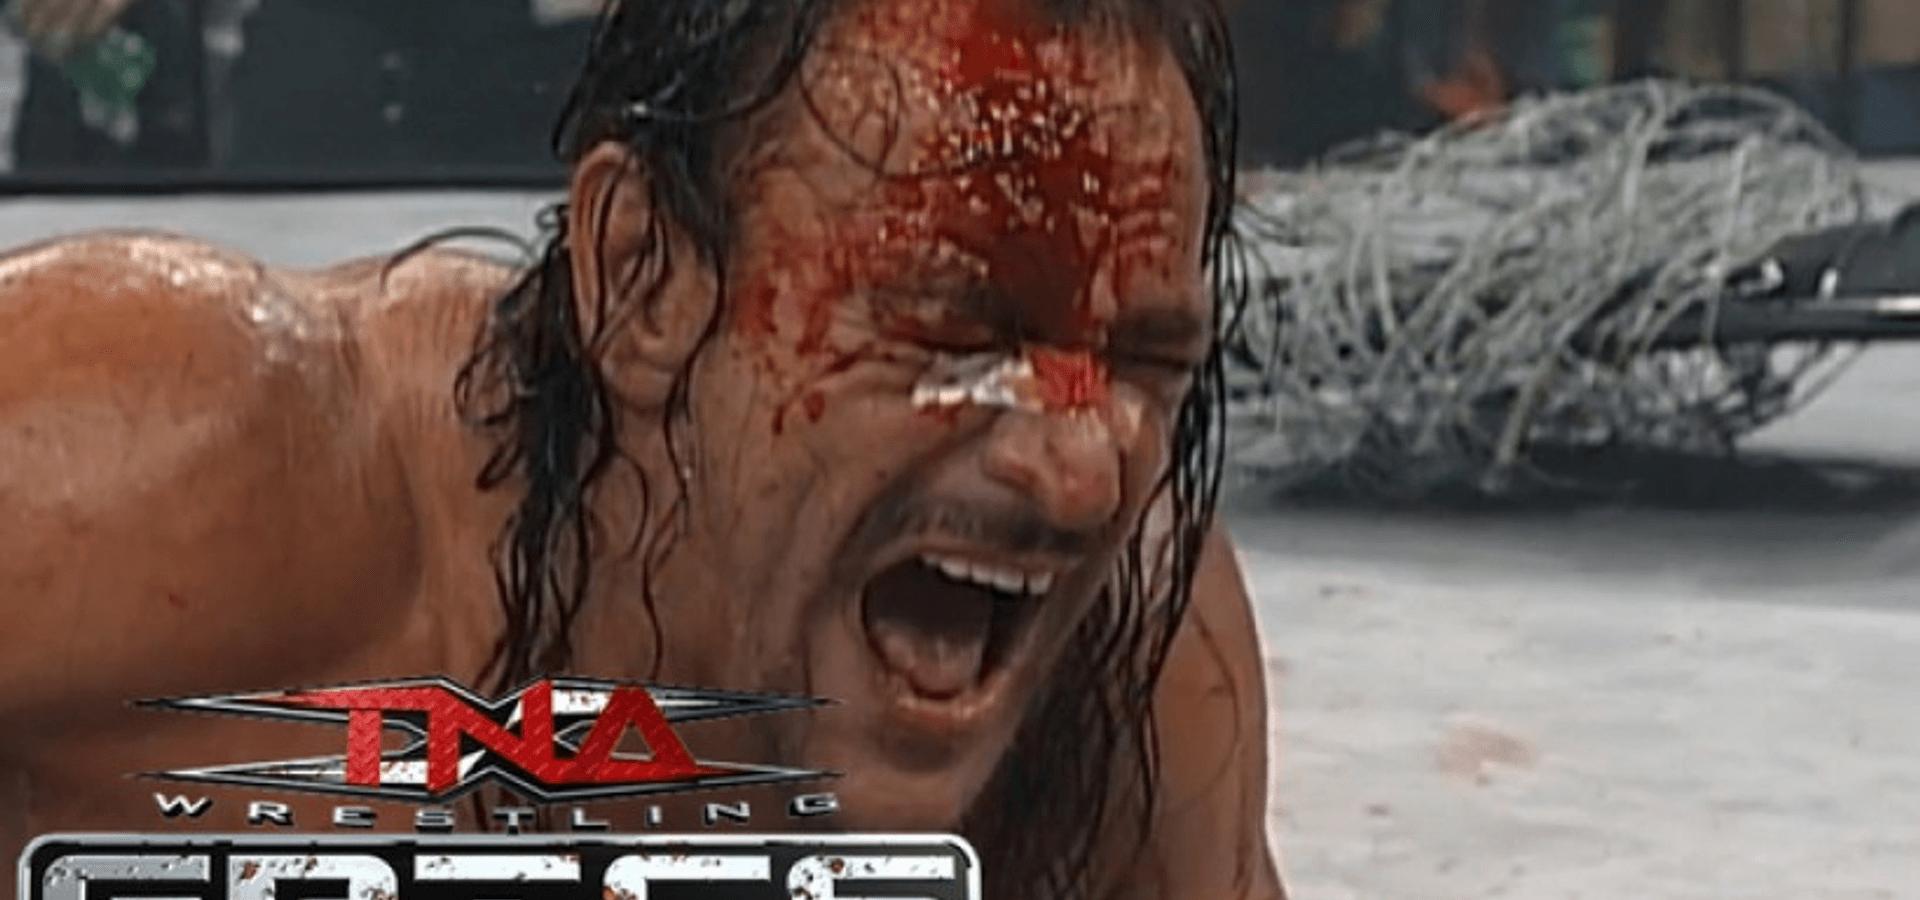 TNA Epics: The Hardcore Wars